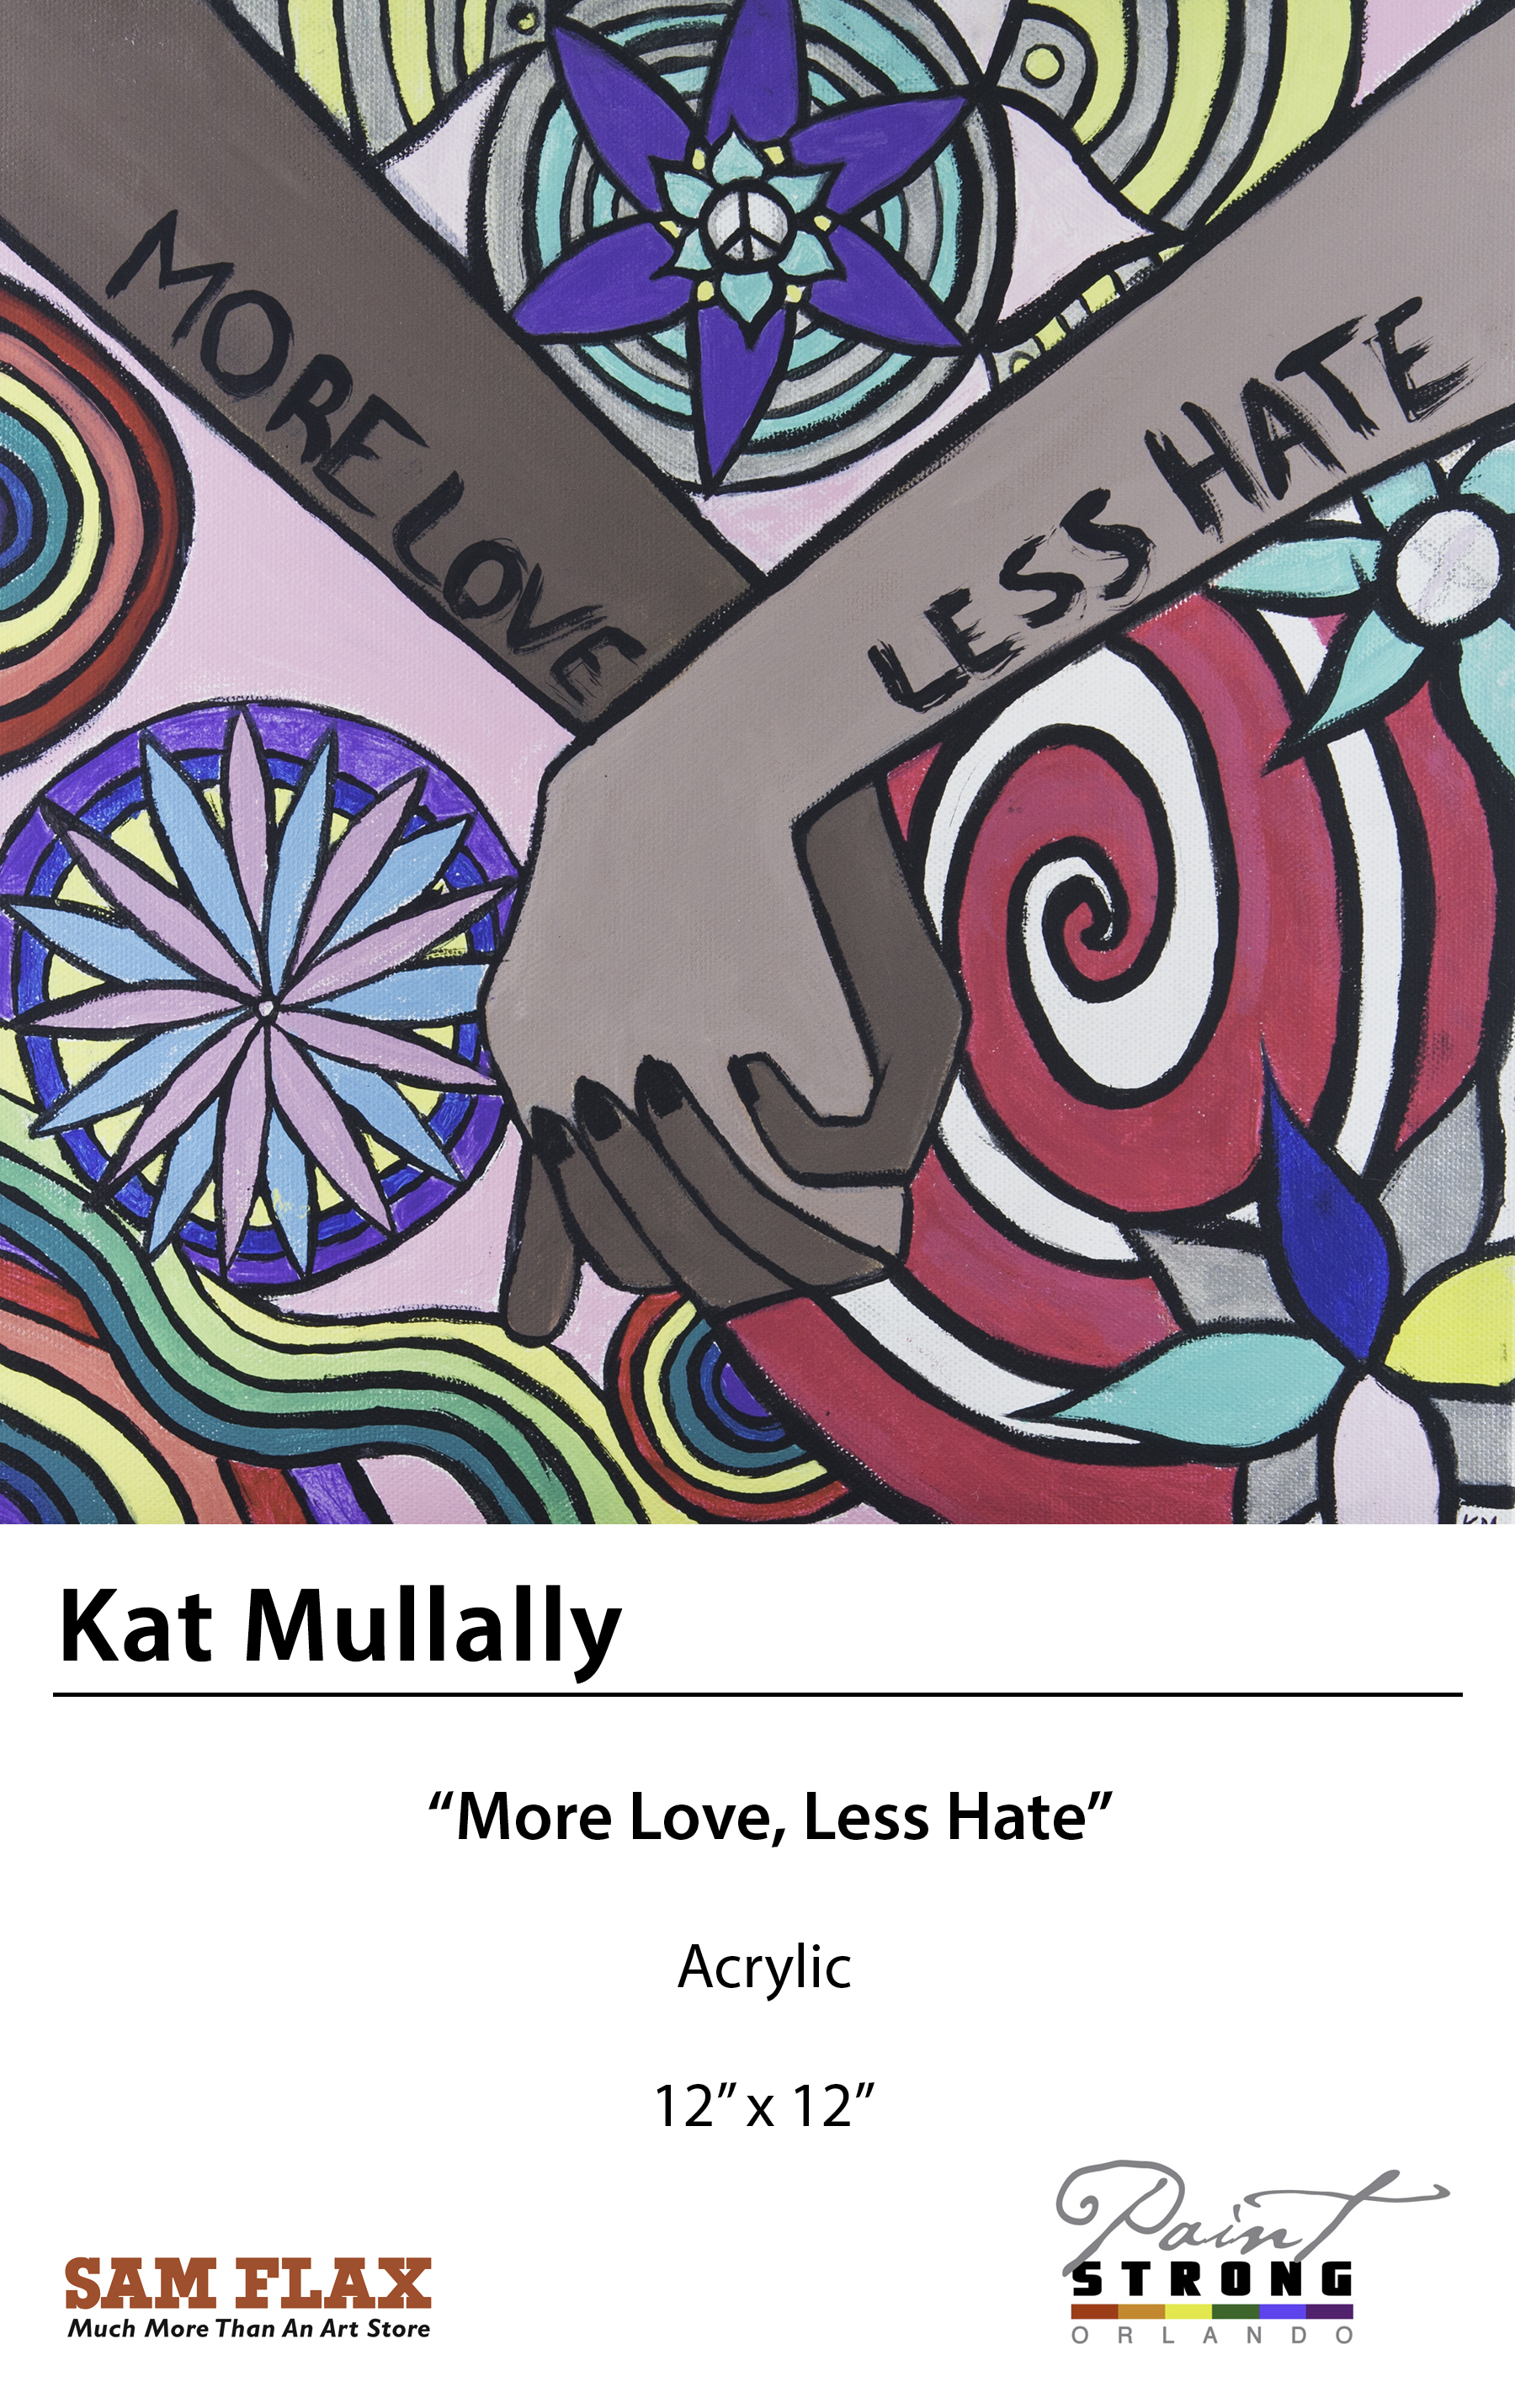 Kat Mullally